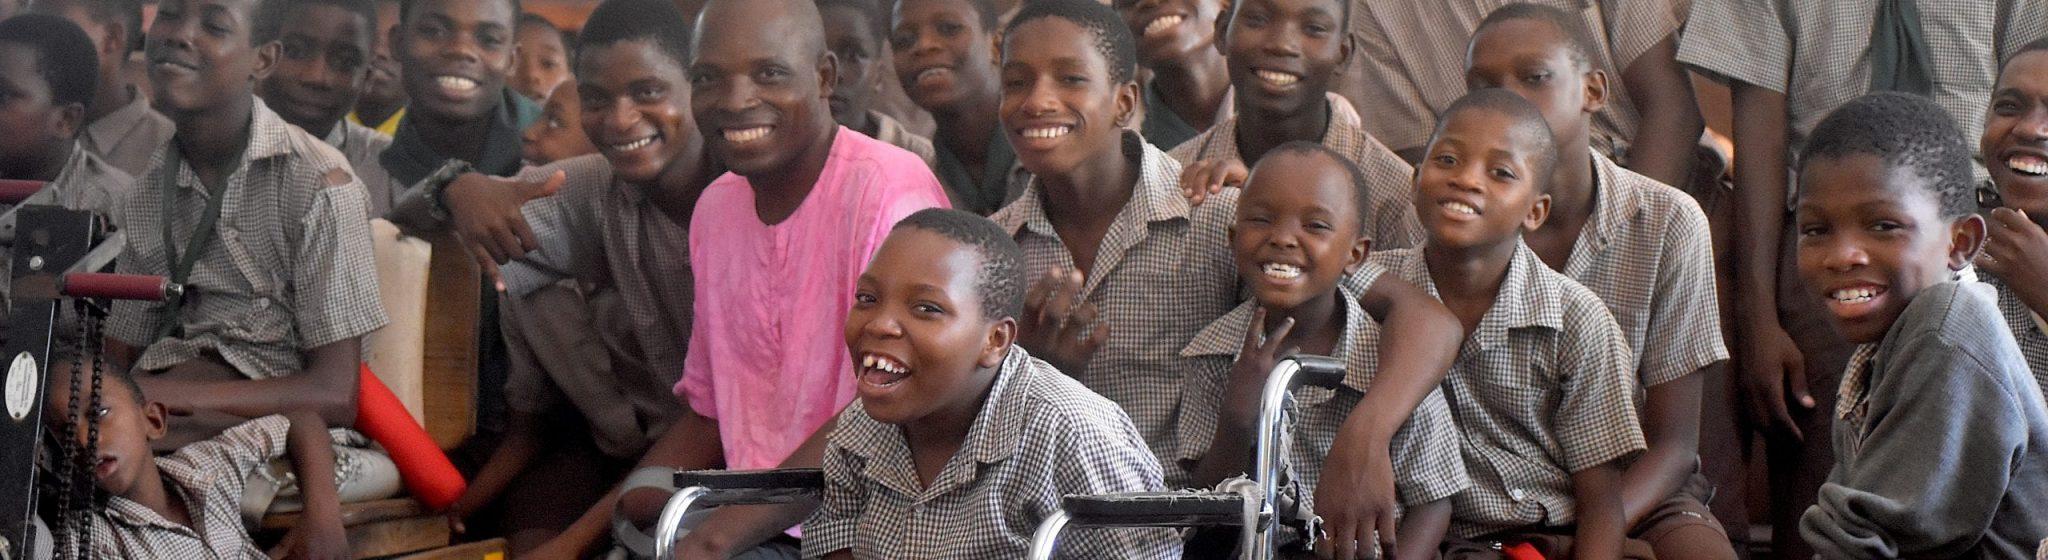 20 Kenyan boys sitting together and smiling.